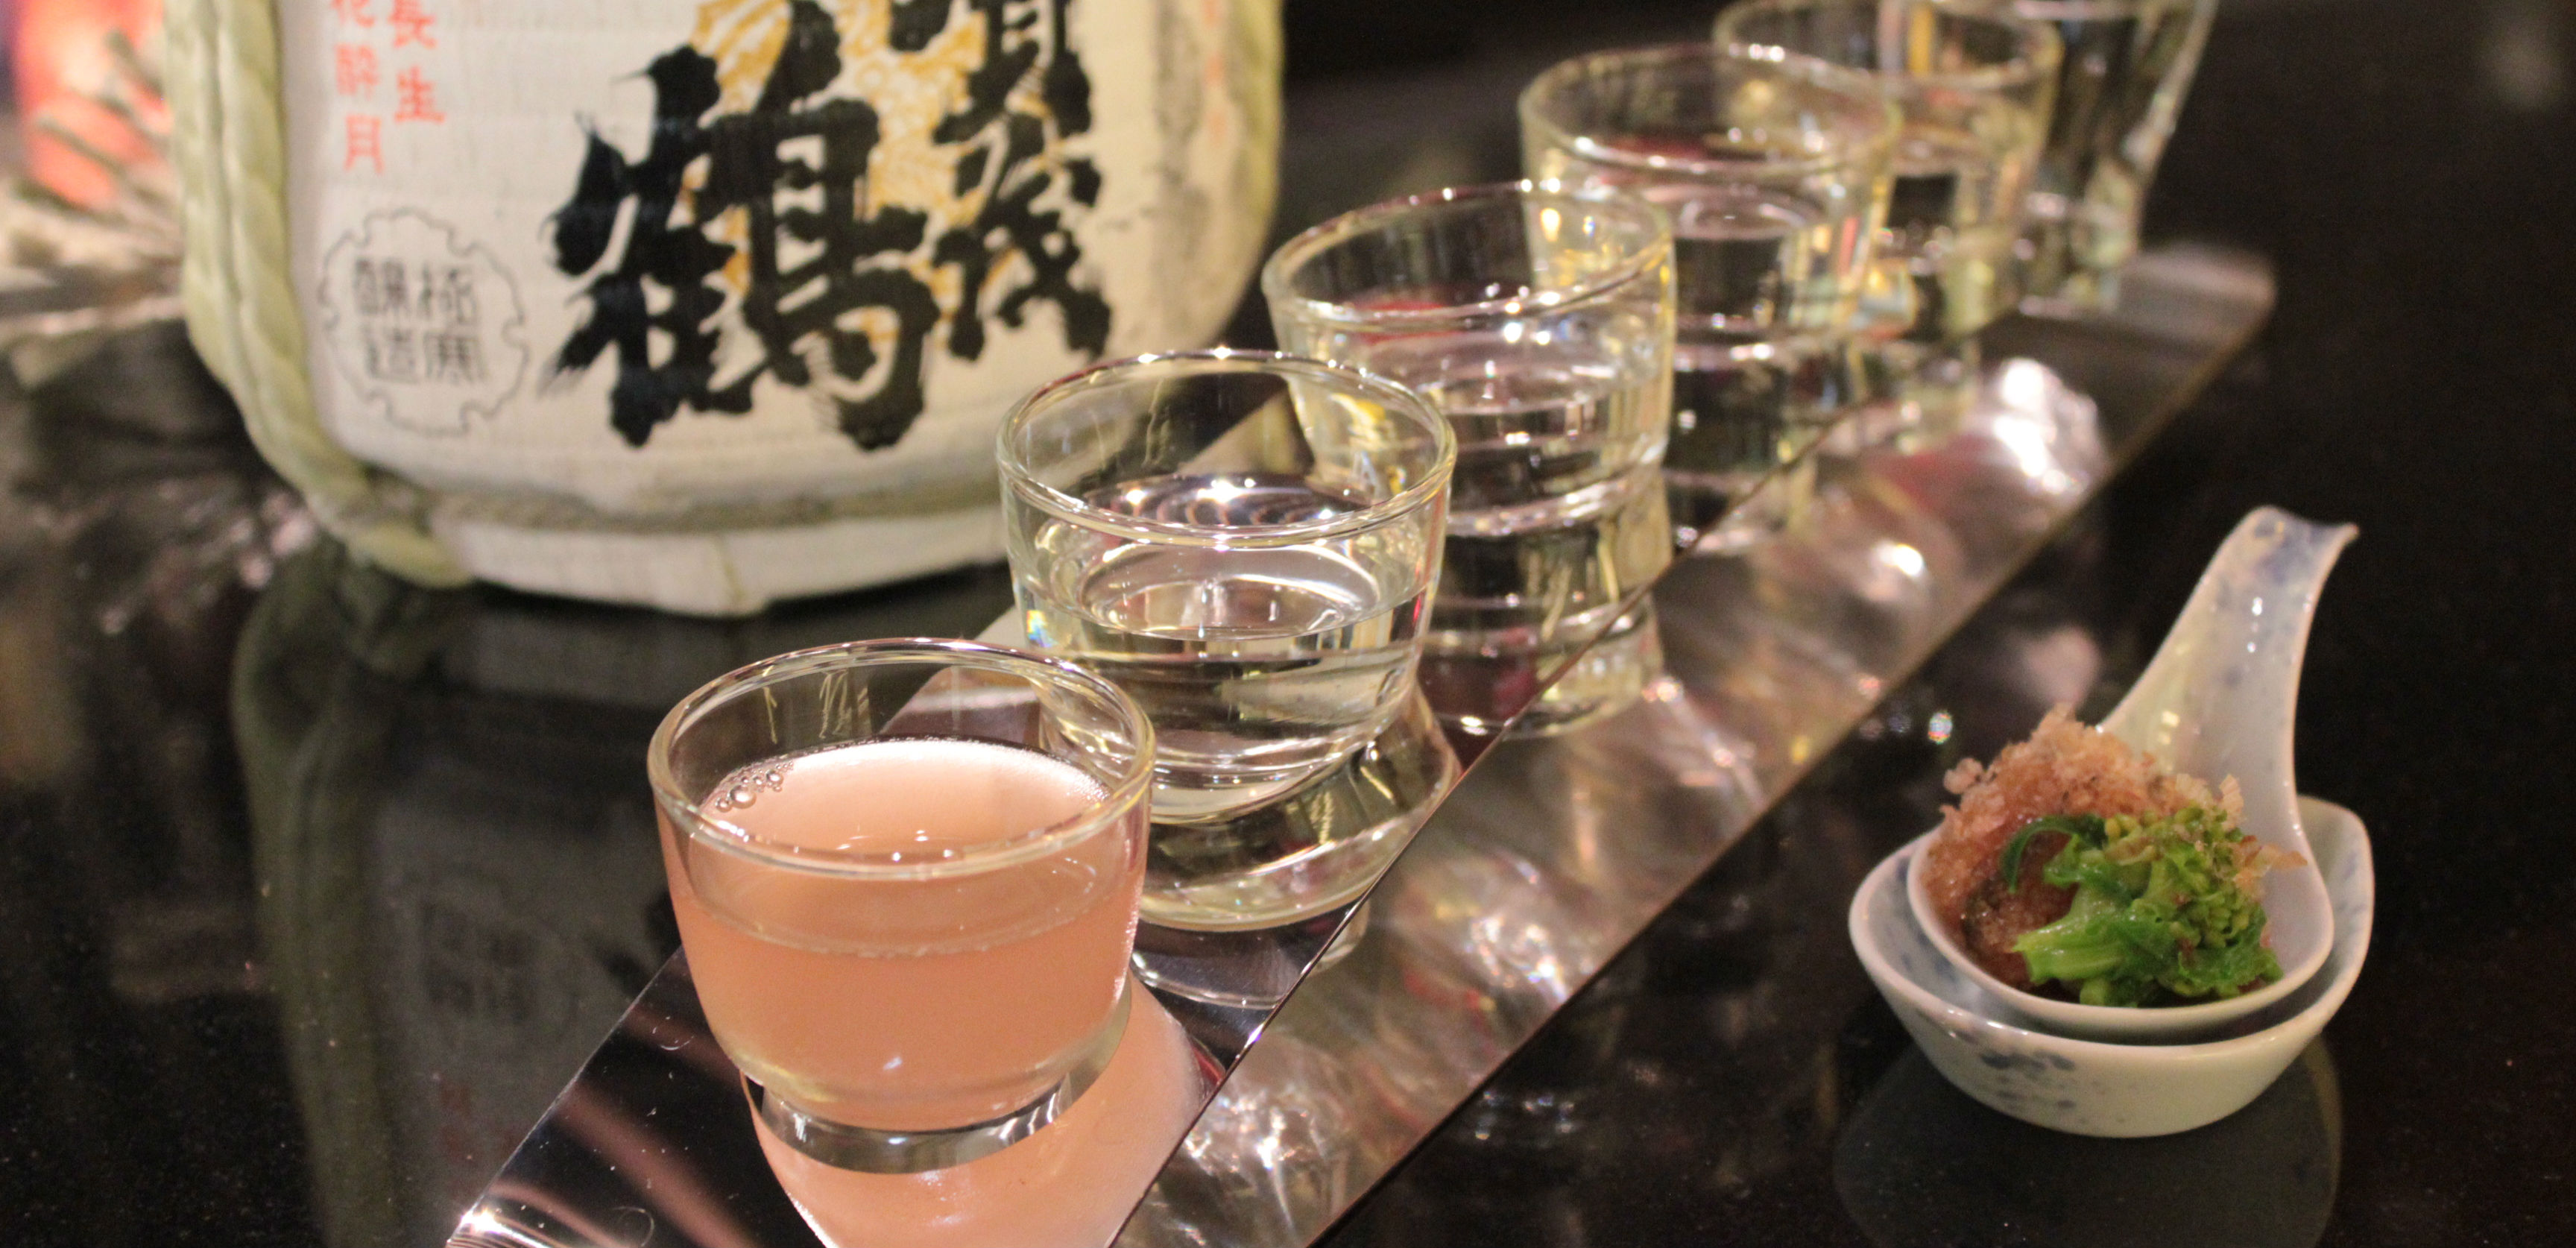 sake shibuya ristorante giappone giapponese reggio emilia parma